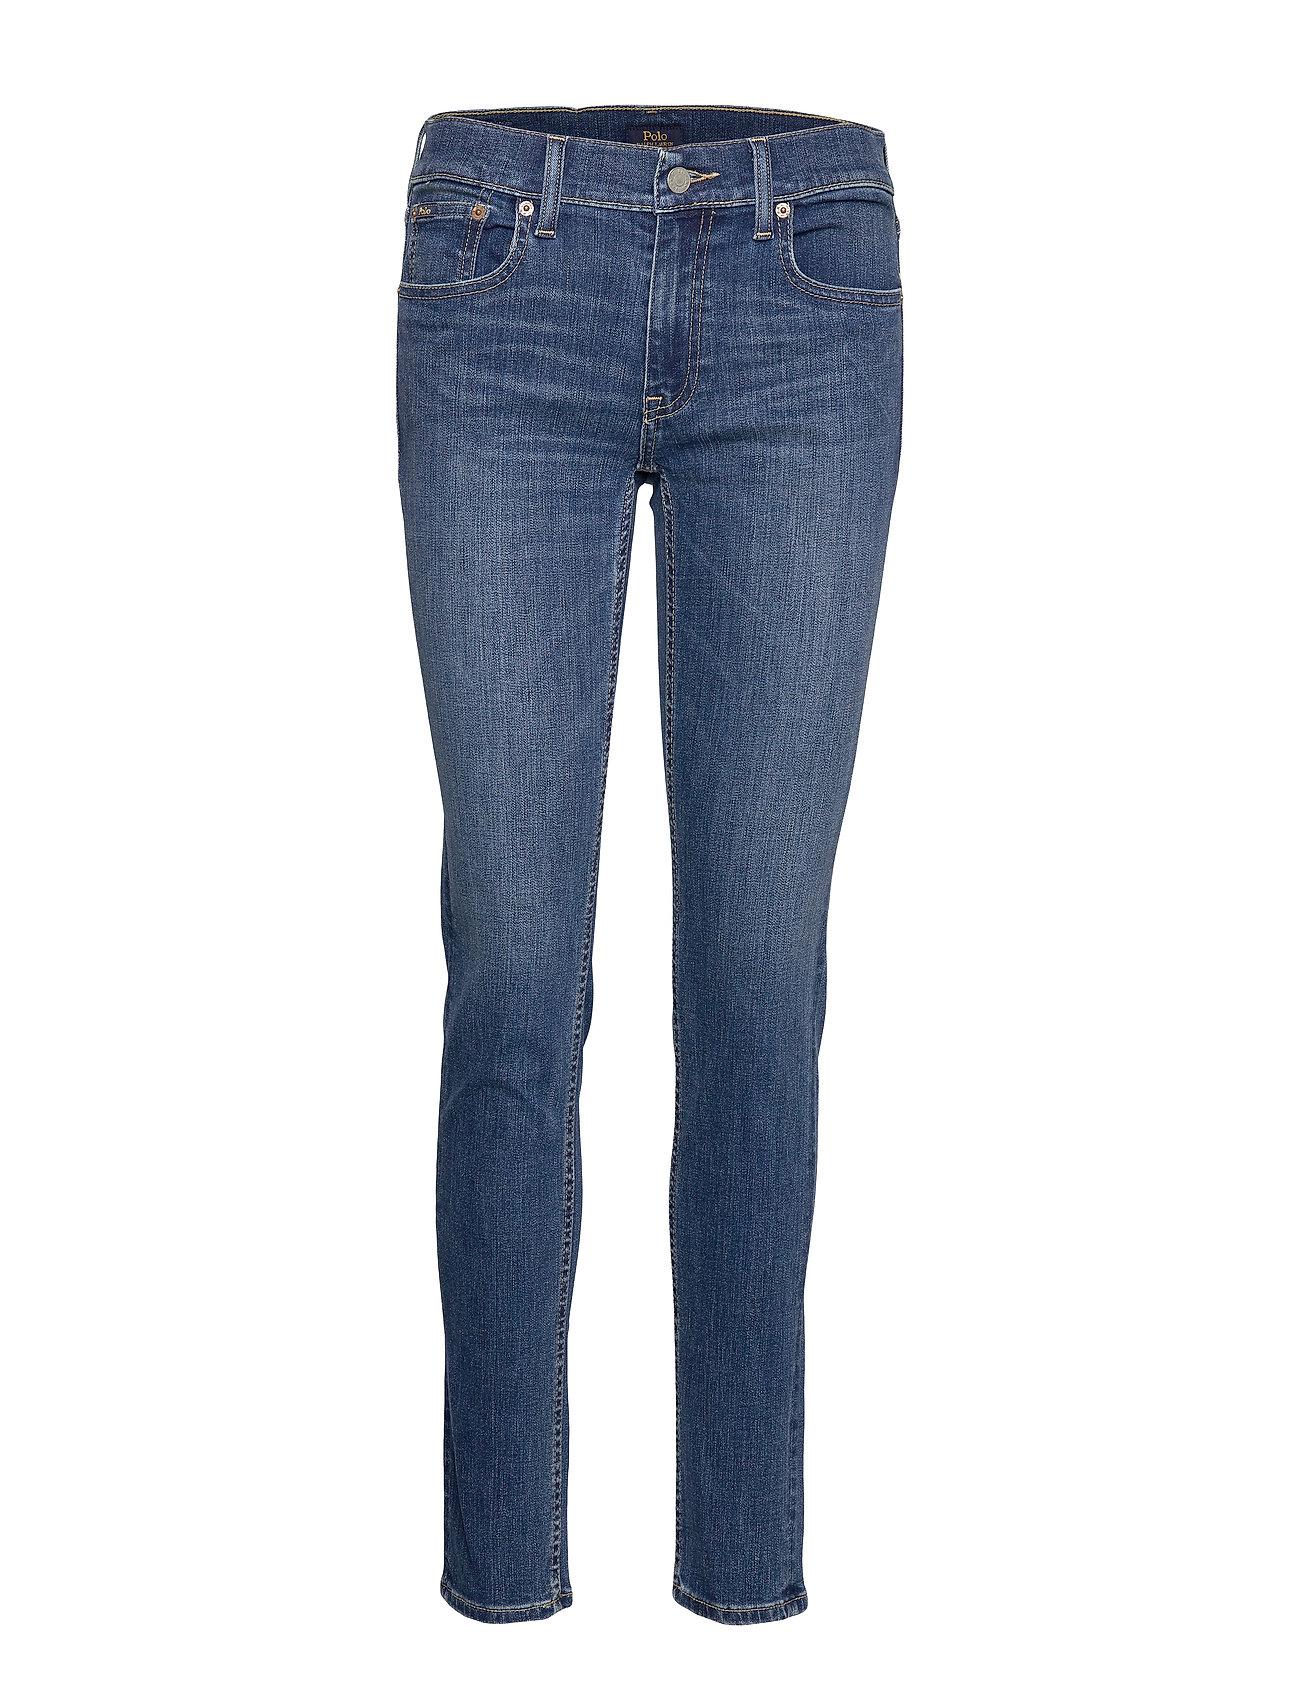 Polo Ralph Lauren Tompkins Skinny Jean - MEDIUM INDIGO